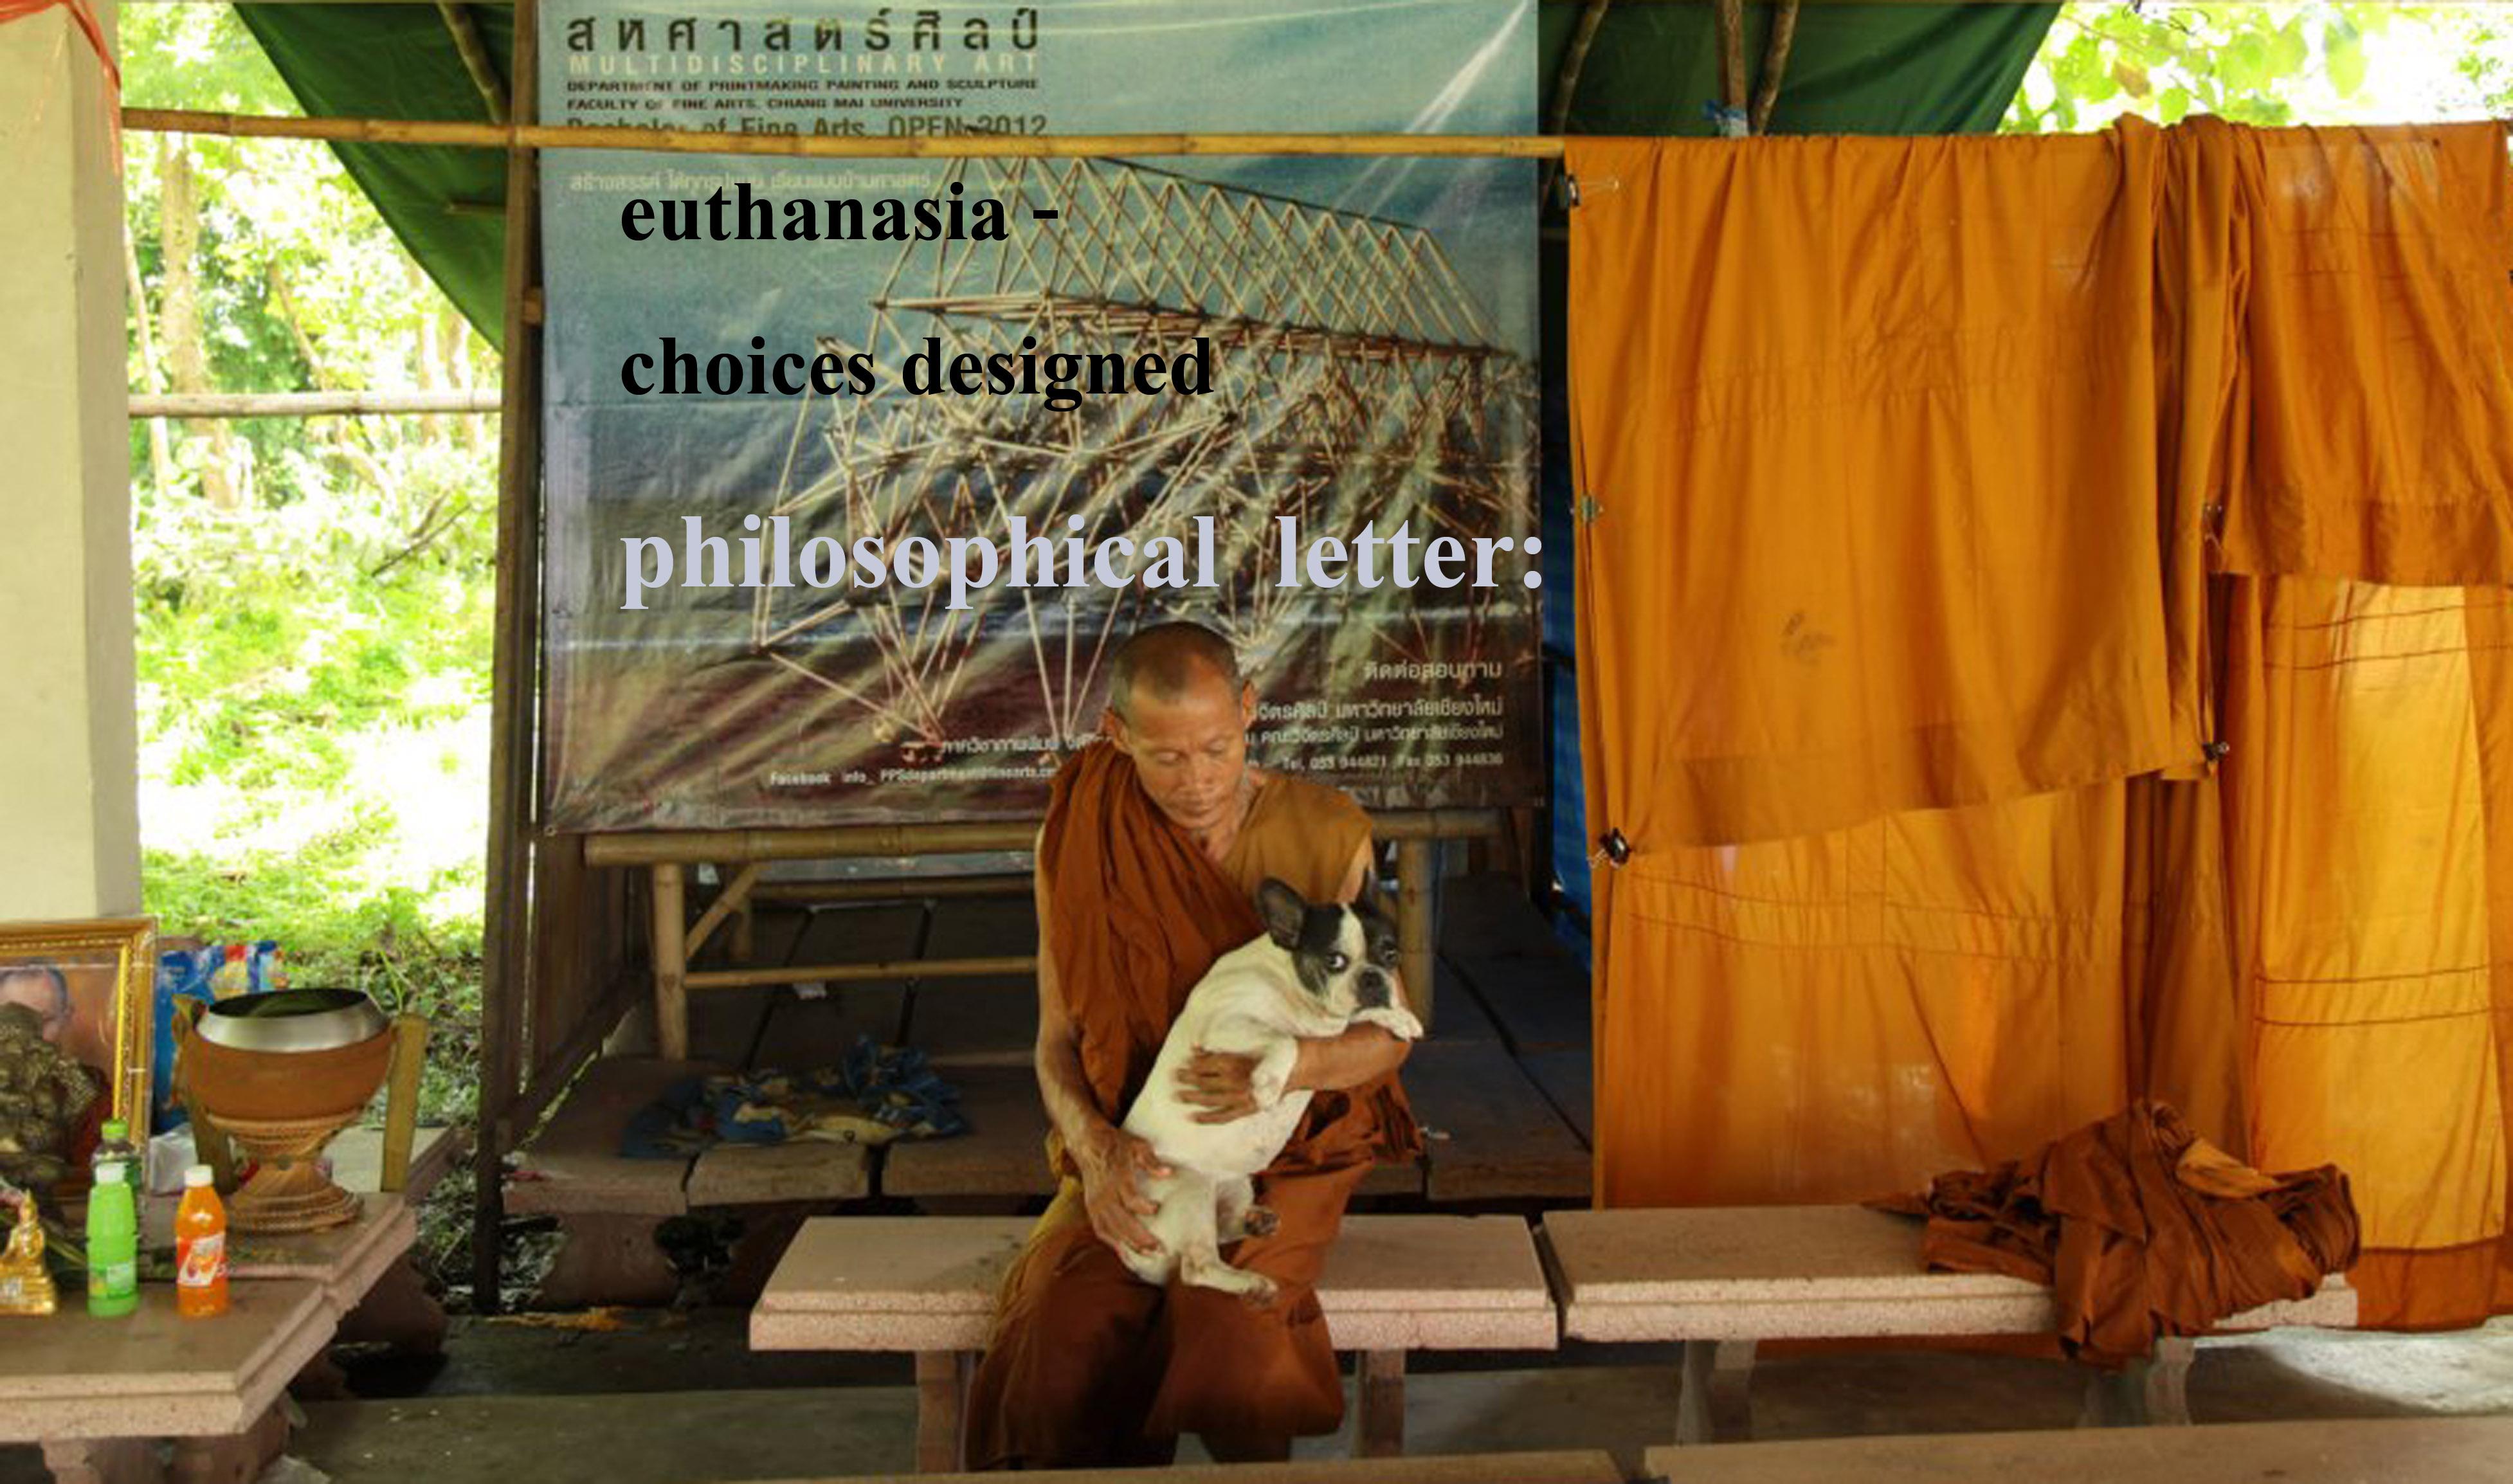 5.philosophical letter copy